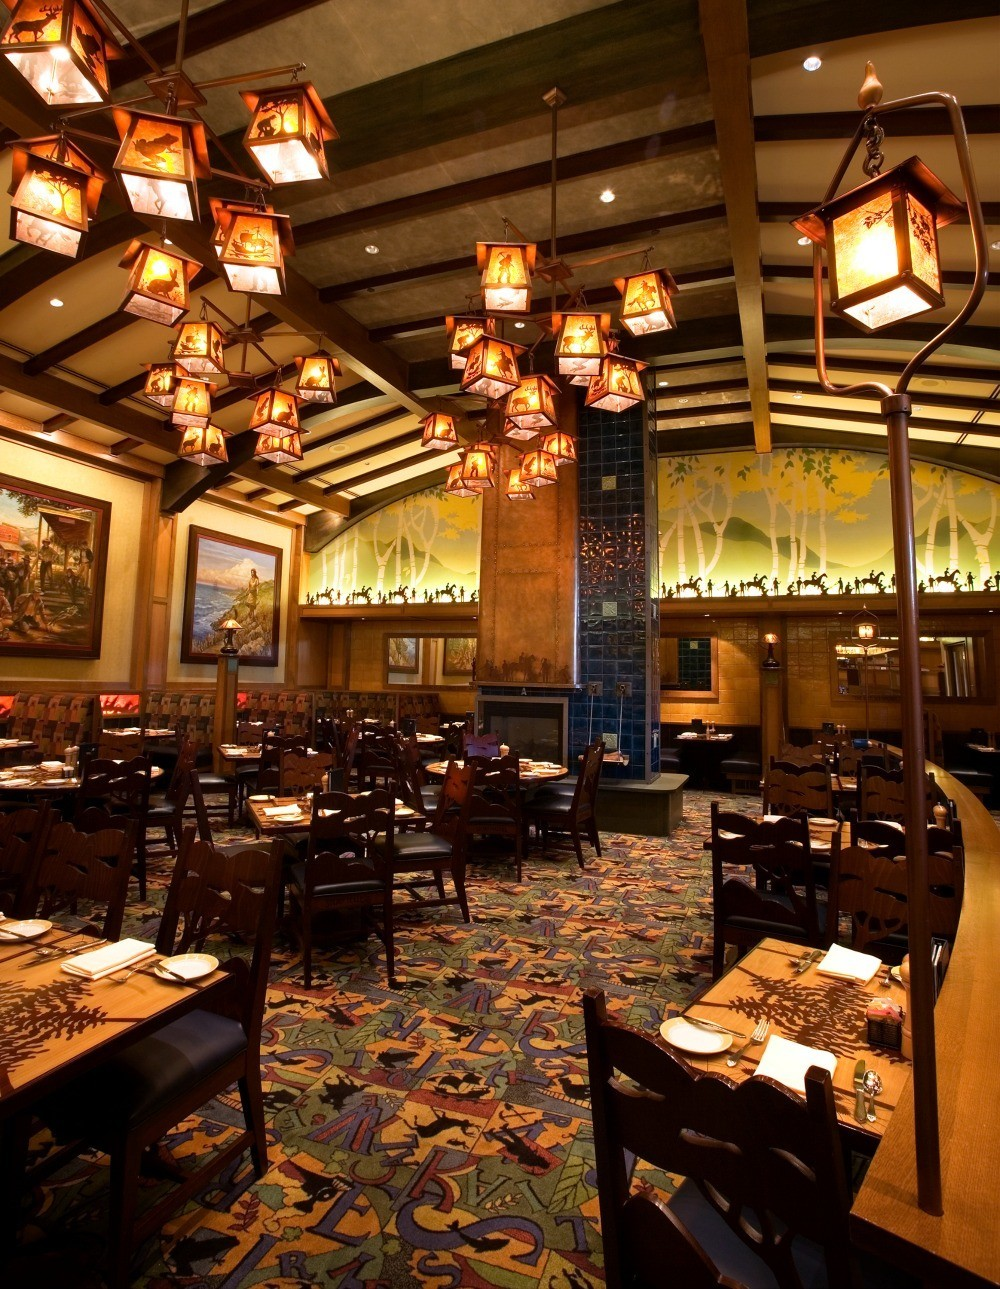 Storytellers Café, Disney's Grand Californian Hotel & Spa